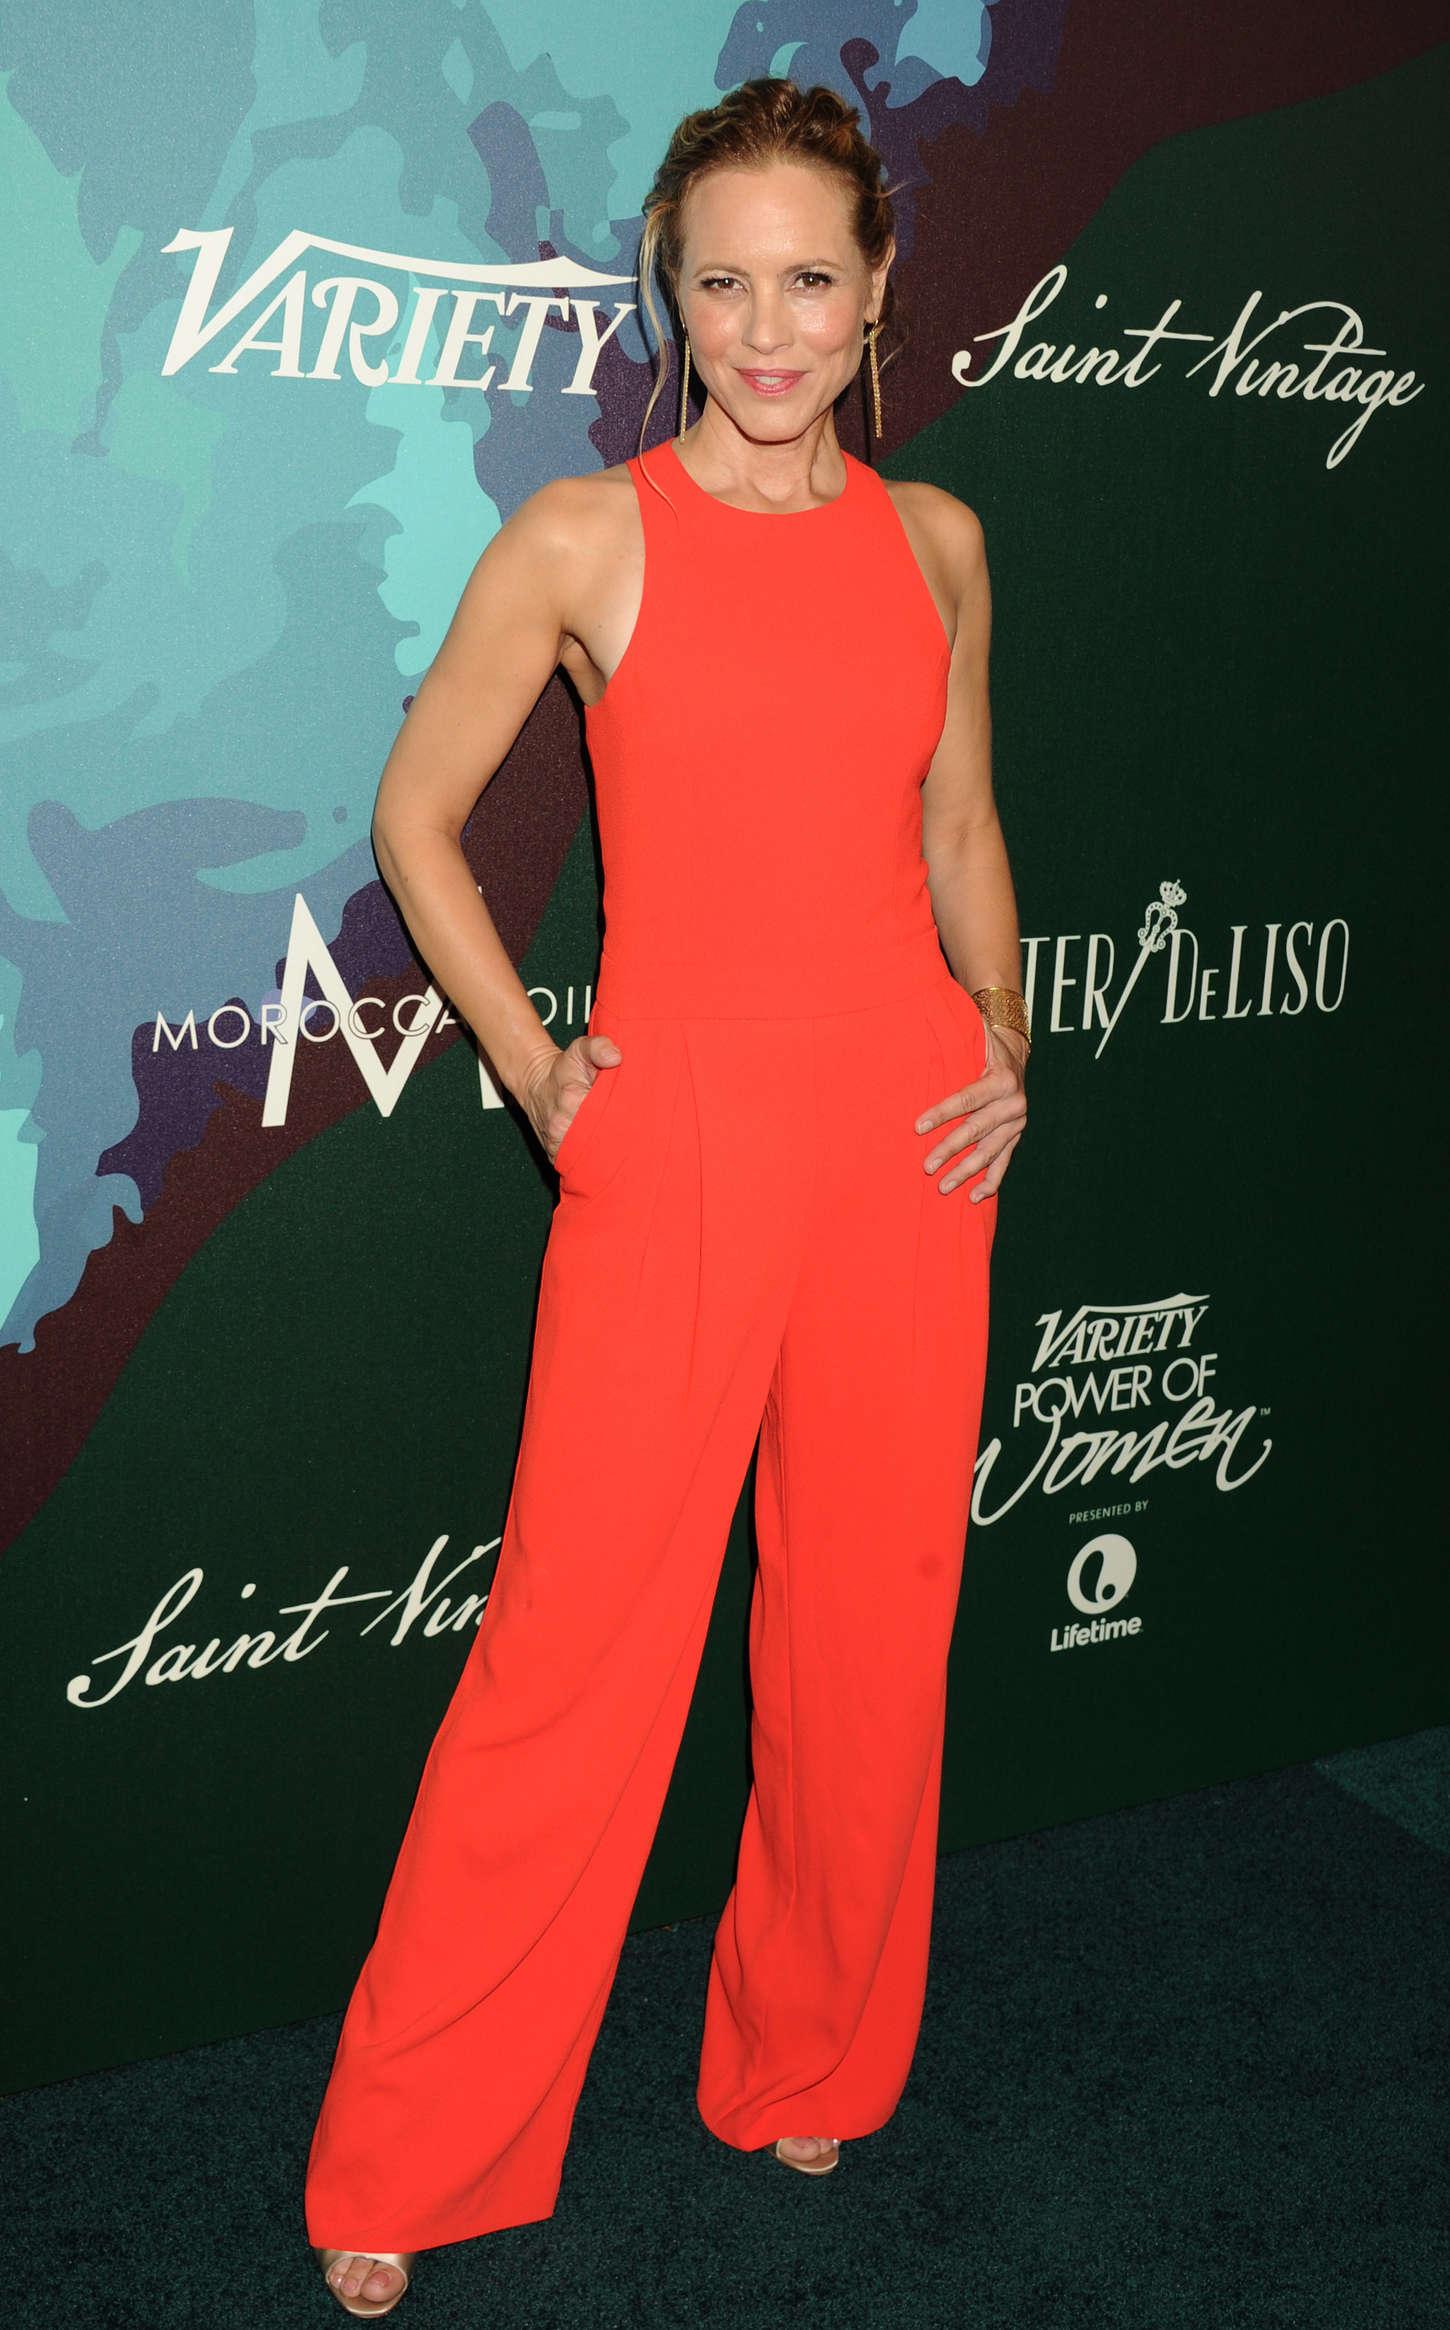 Maria Bello - 2014 Variety Power of Women in LA